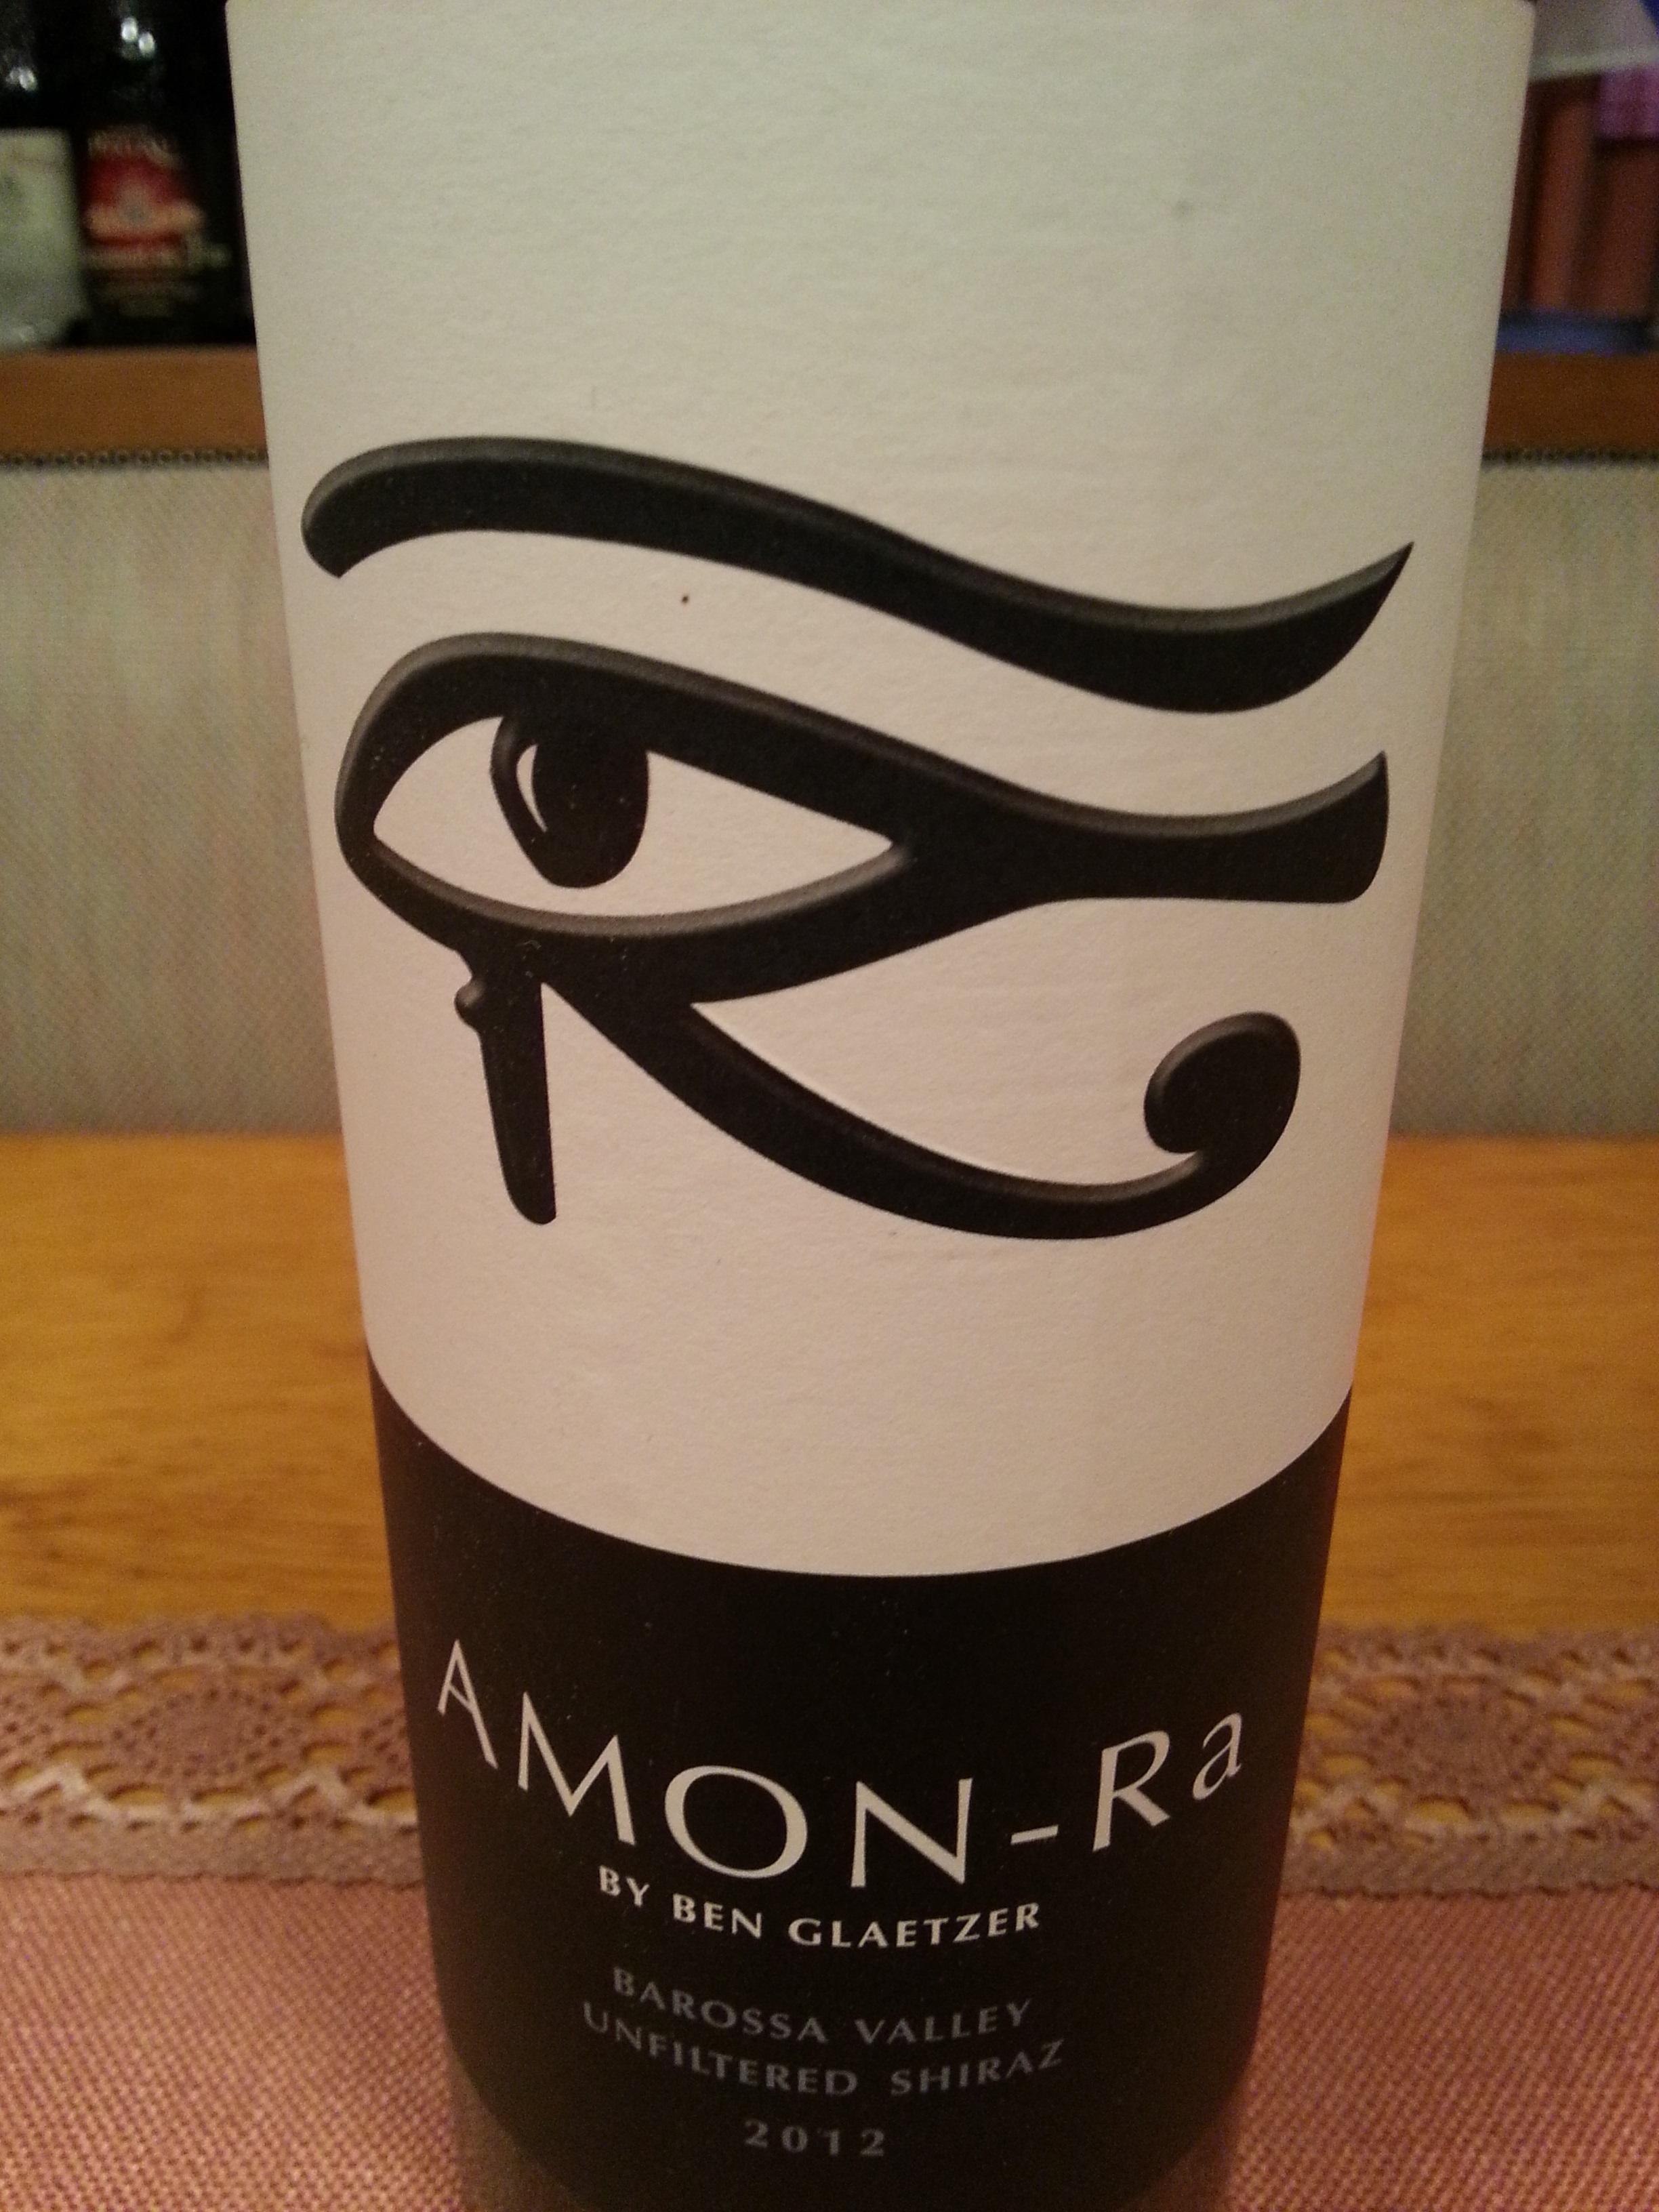 2012 Amon-Ra | Glaetzer